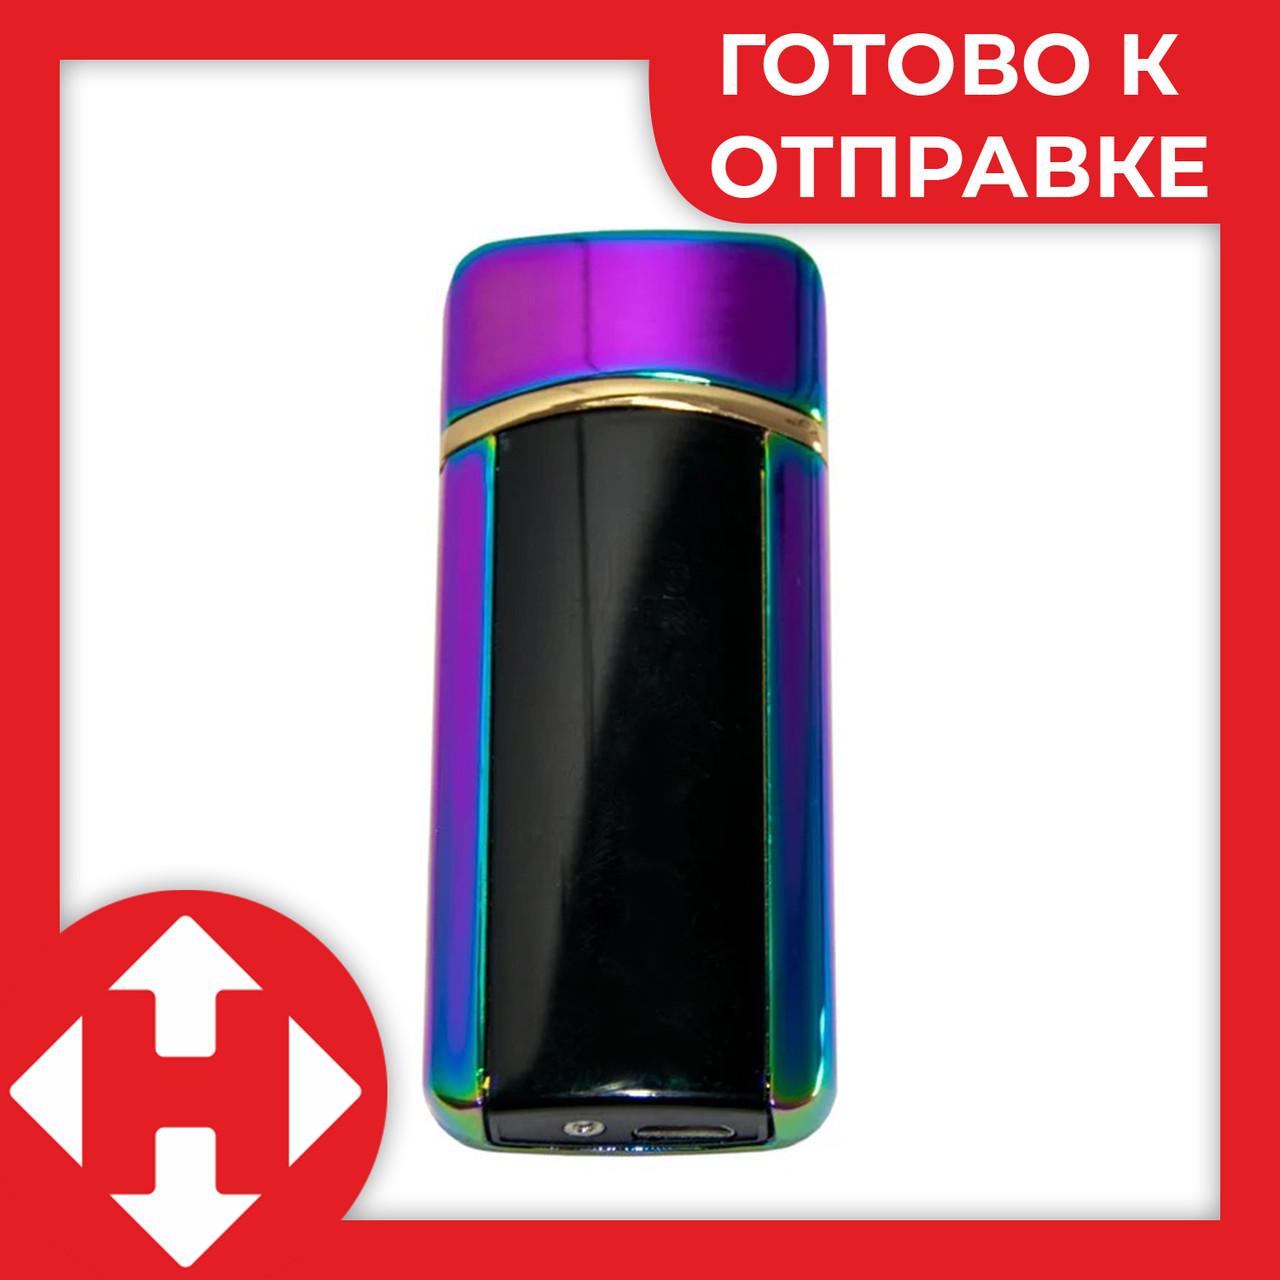 Электронная сенсорная зажигалка Classic Fashionable BMW (5403 H1) Фиолетовая, от USB аккумуляторная